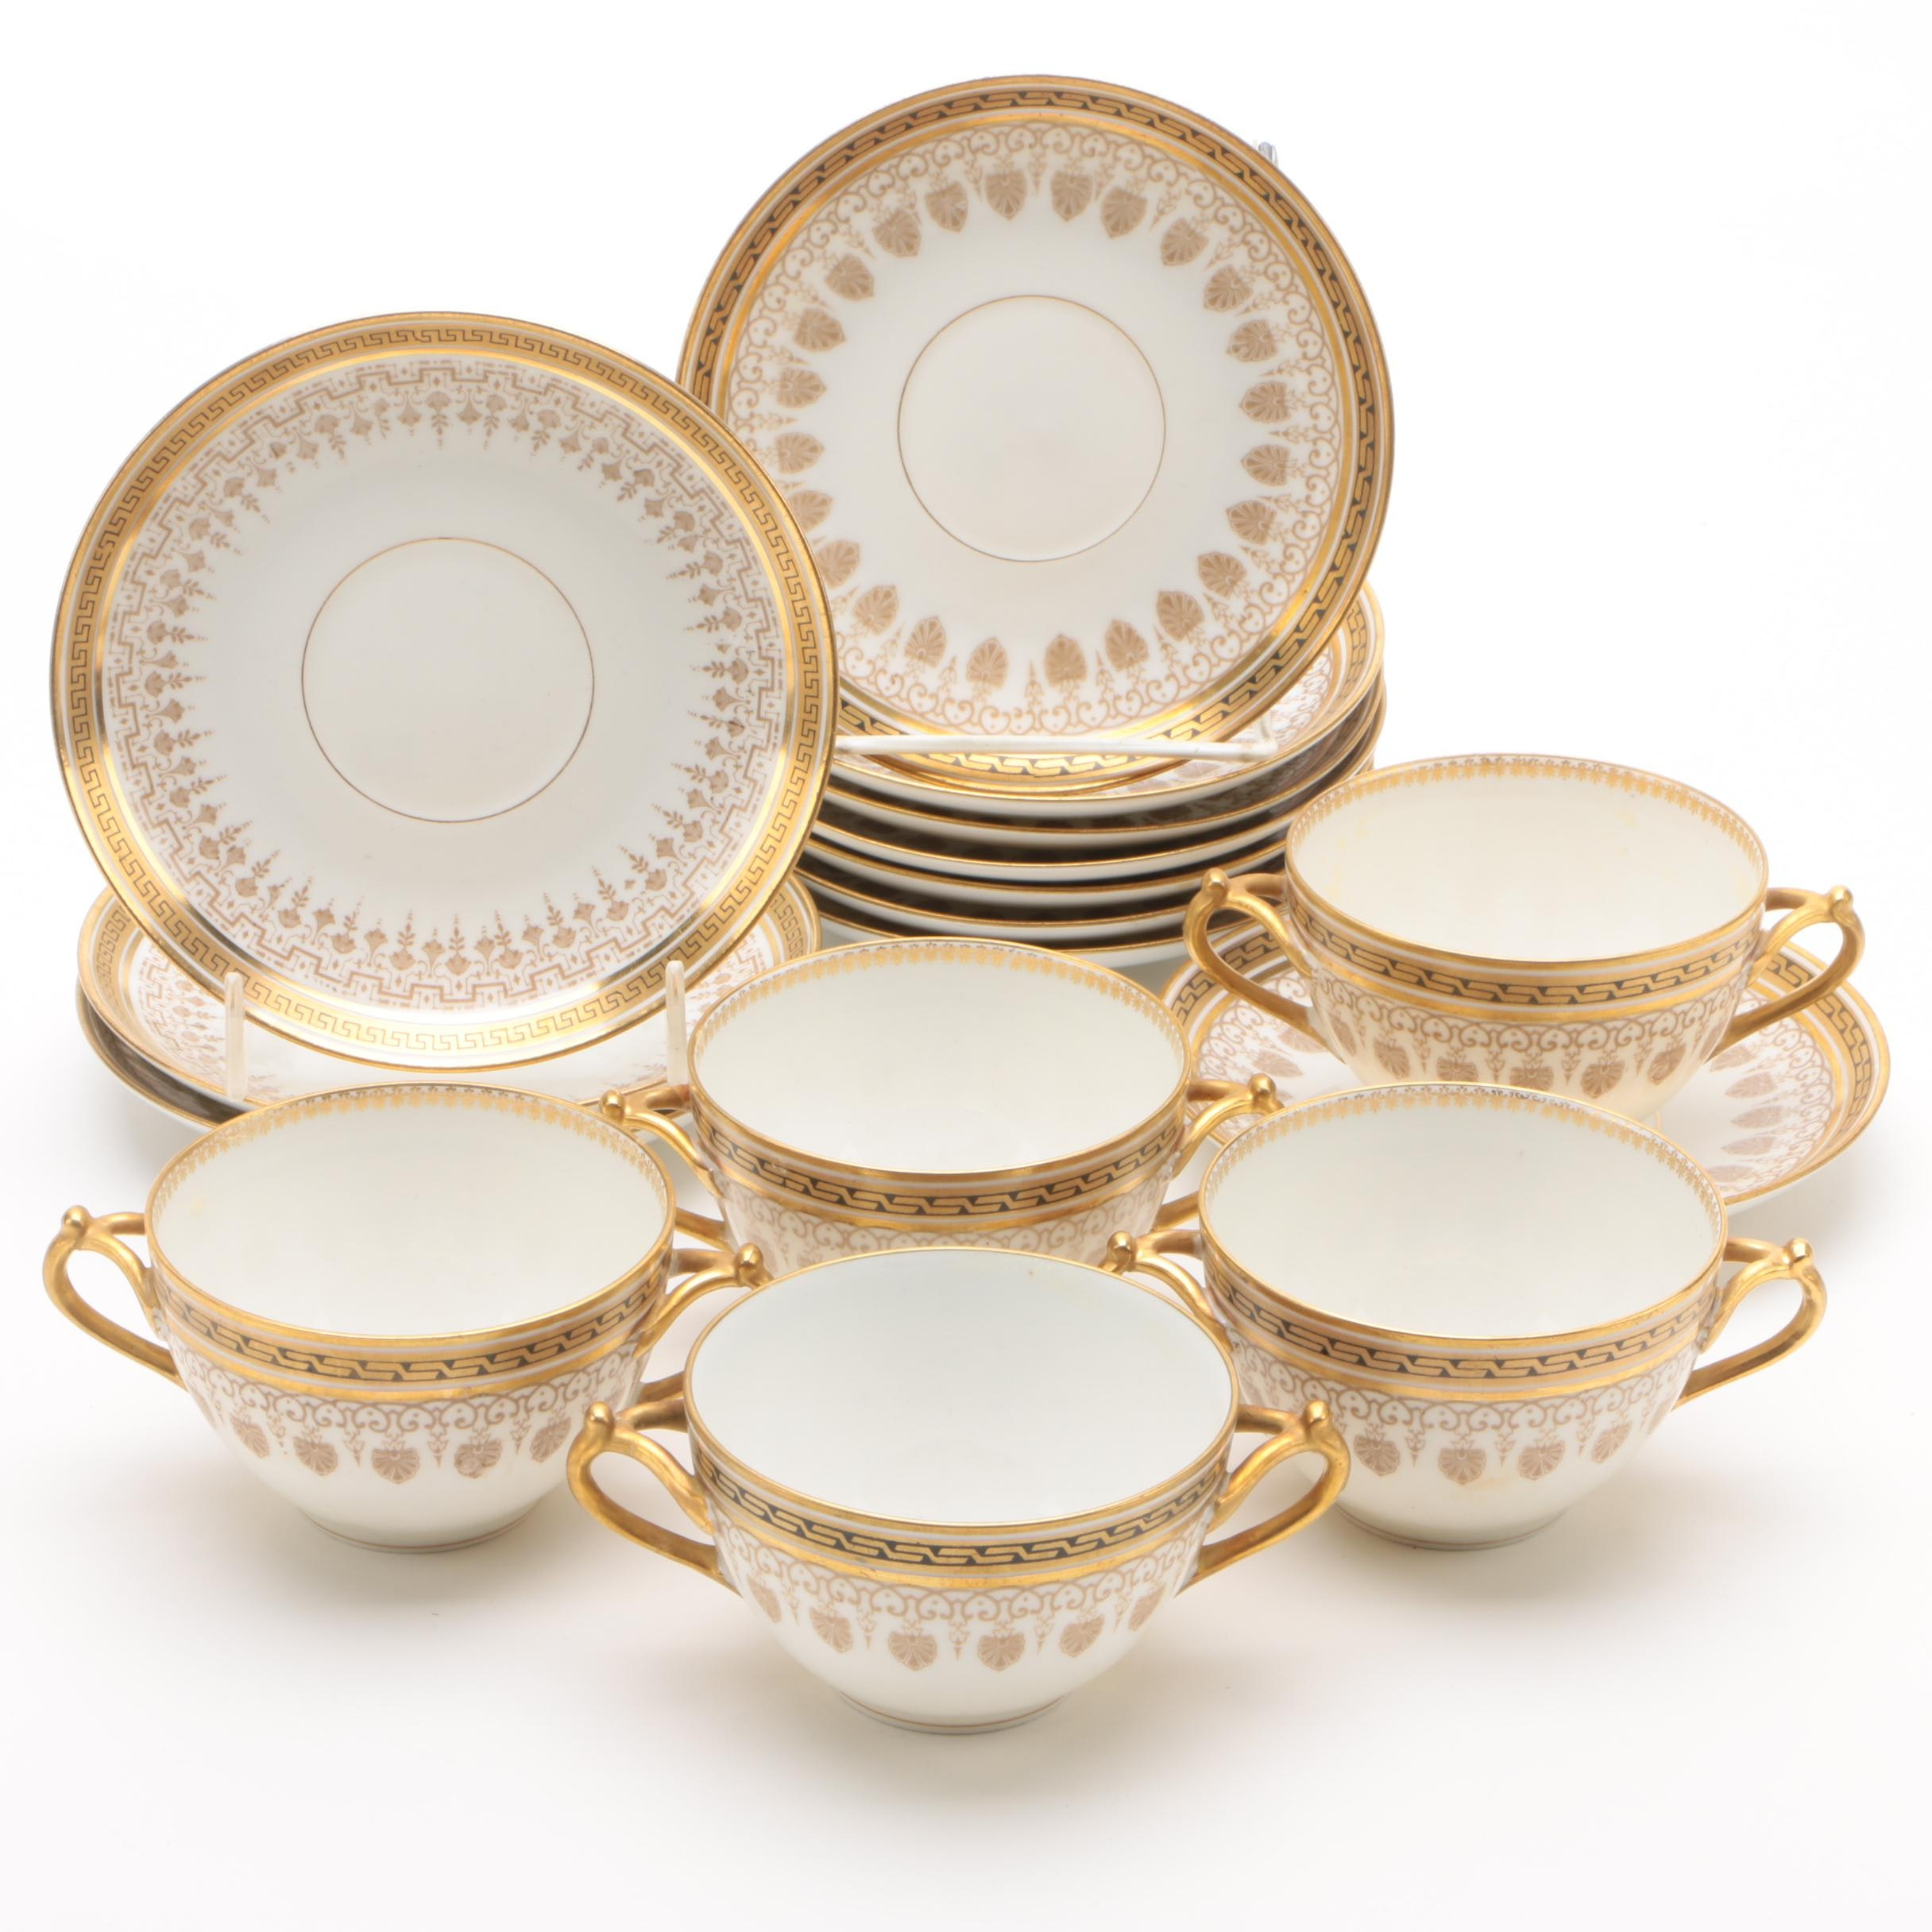 Vintage Bernardaud & Co. Limoges Porcelain Bouillon Cups and Saucers